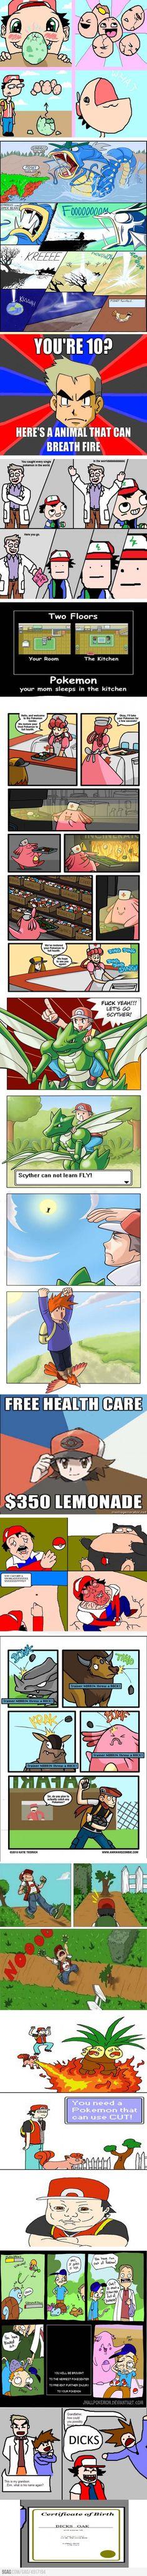 The best of Pokemon Logic